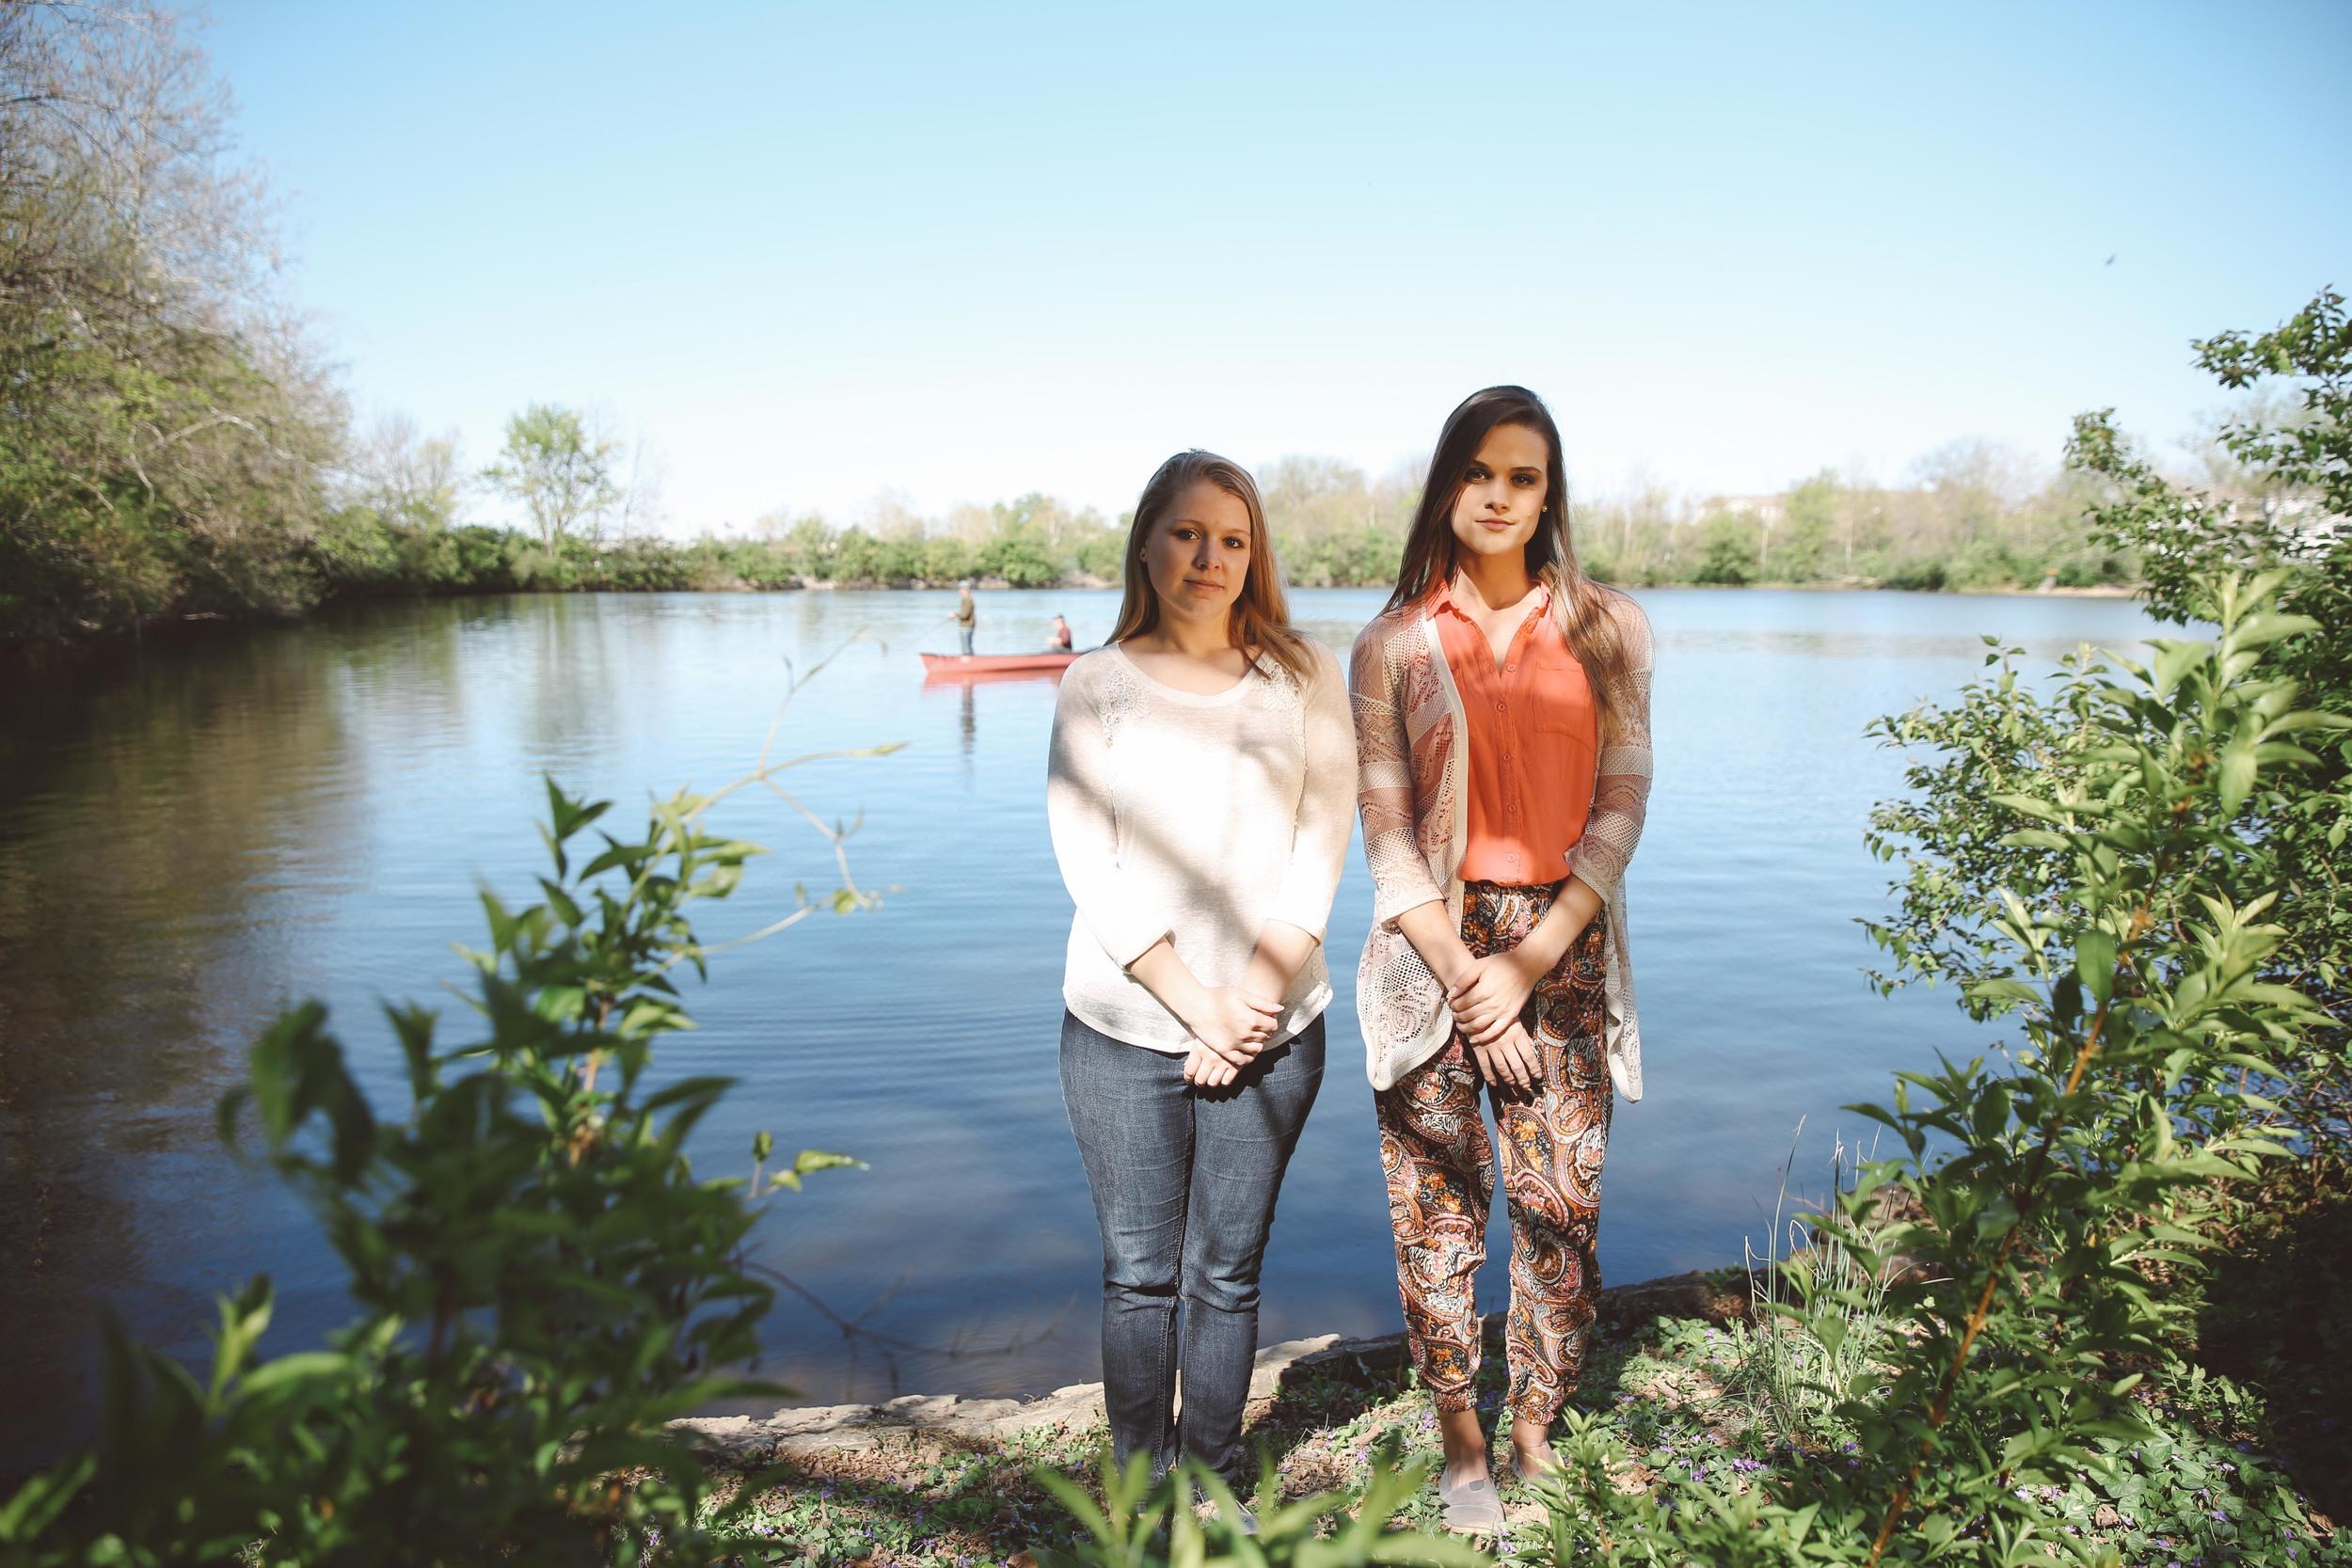 Alyssa Erickson and Kirsten Bohnert, the Kentucky Hempsters